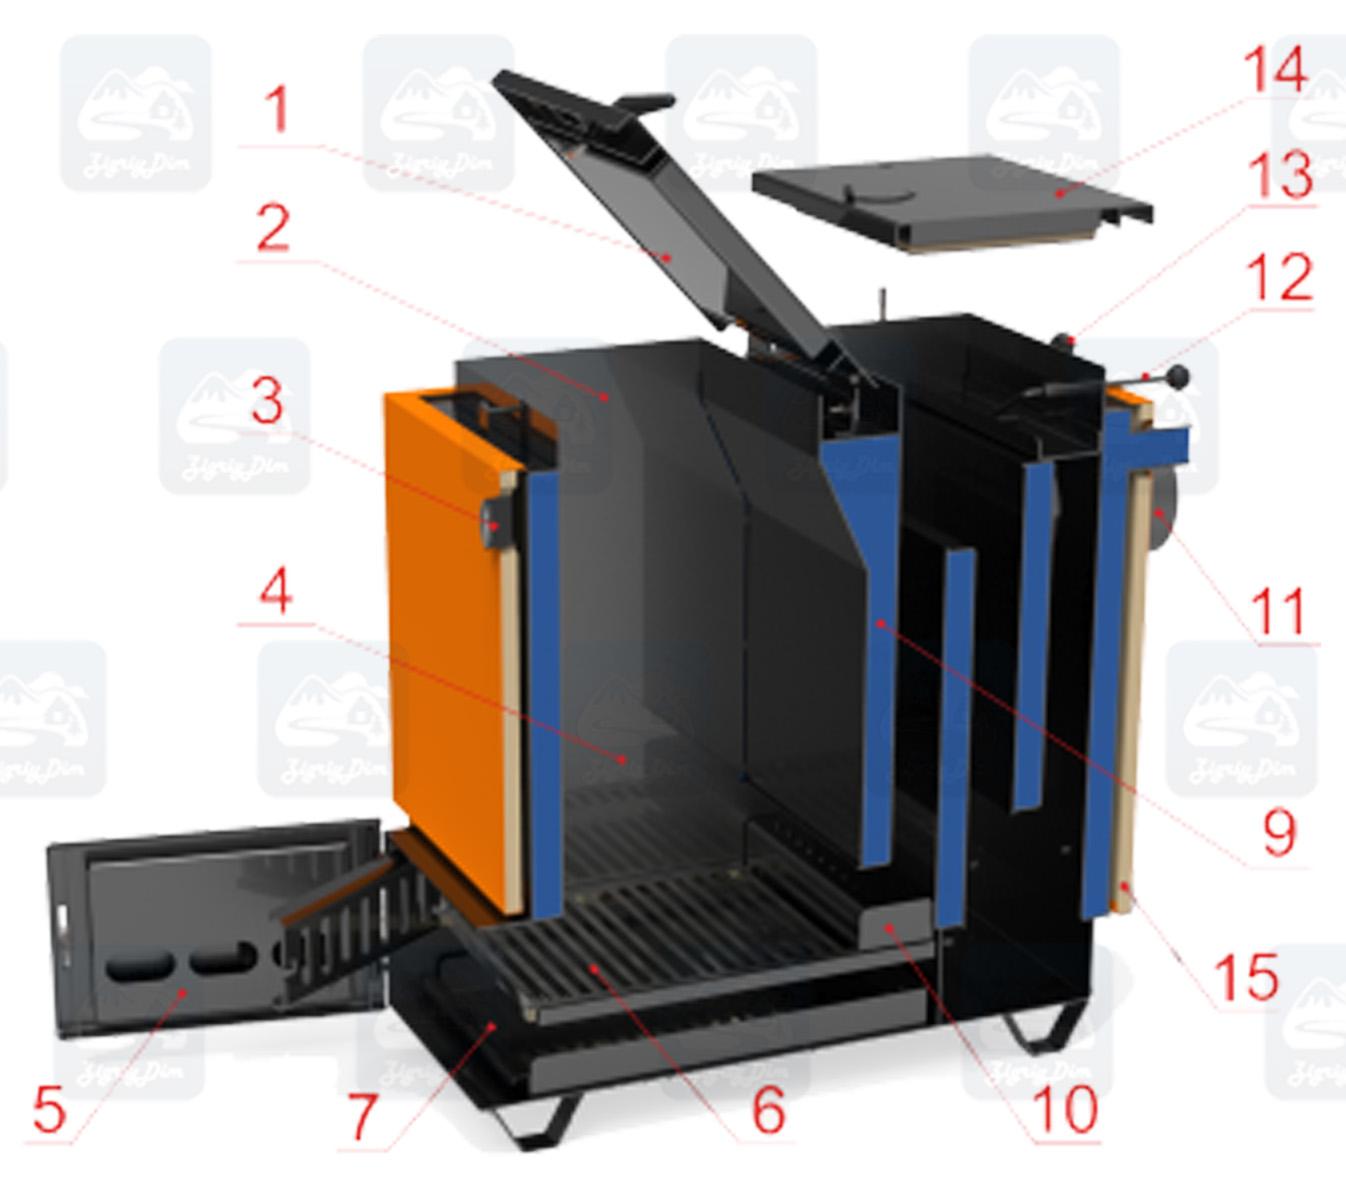 Схема устройства твердотопливного котла Холмова шахтного типа Ретра-6М